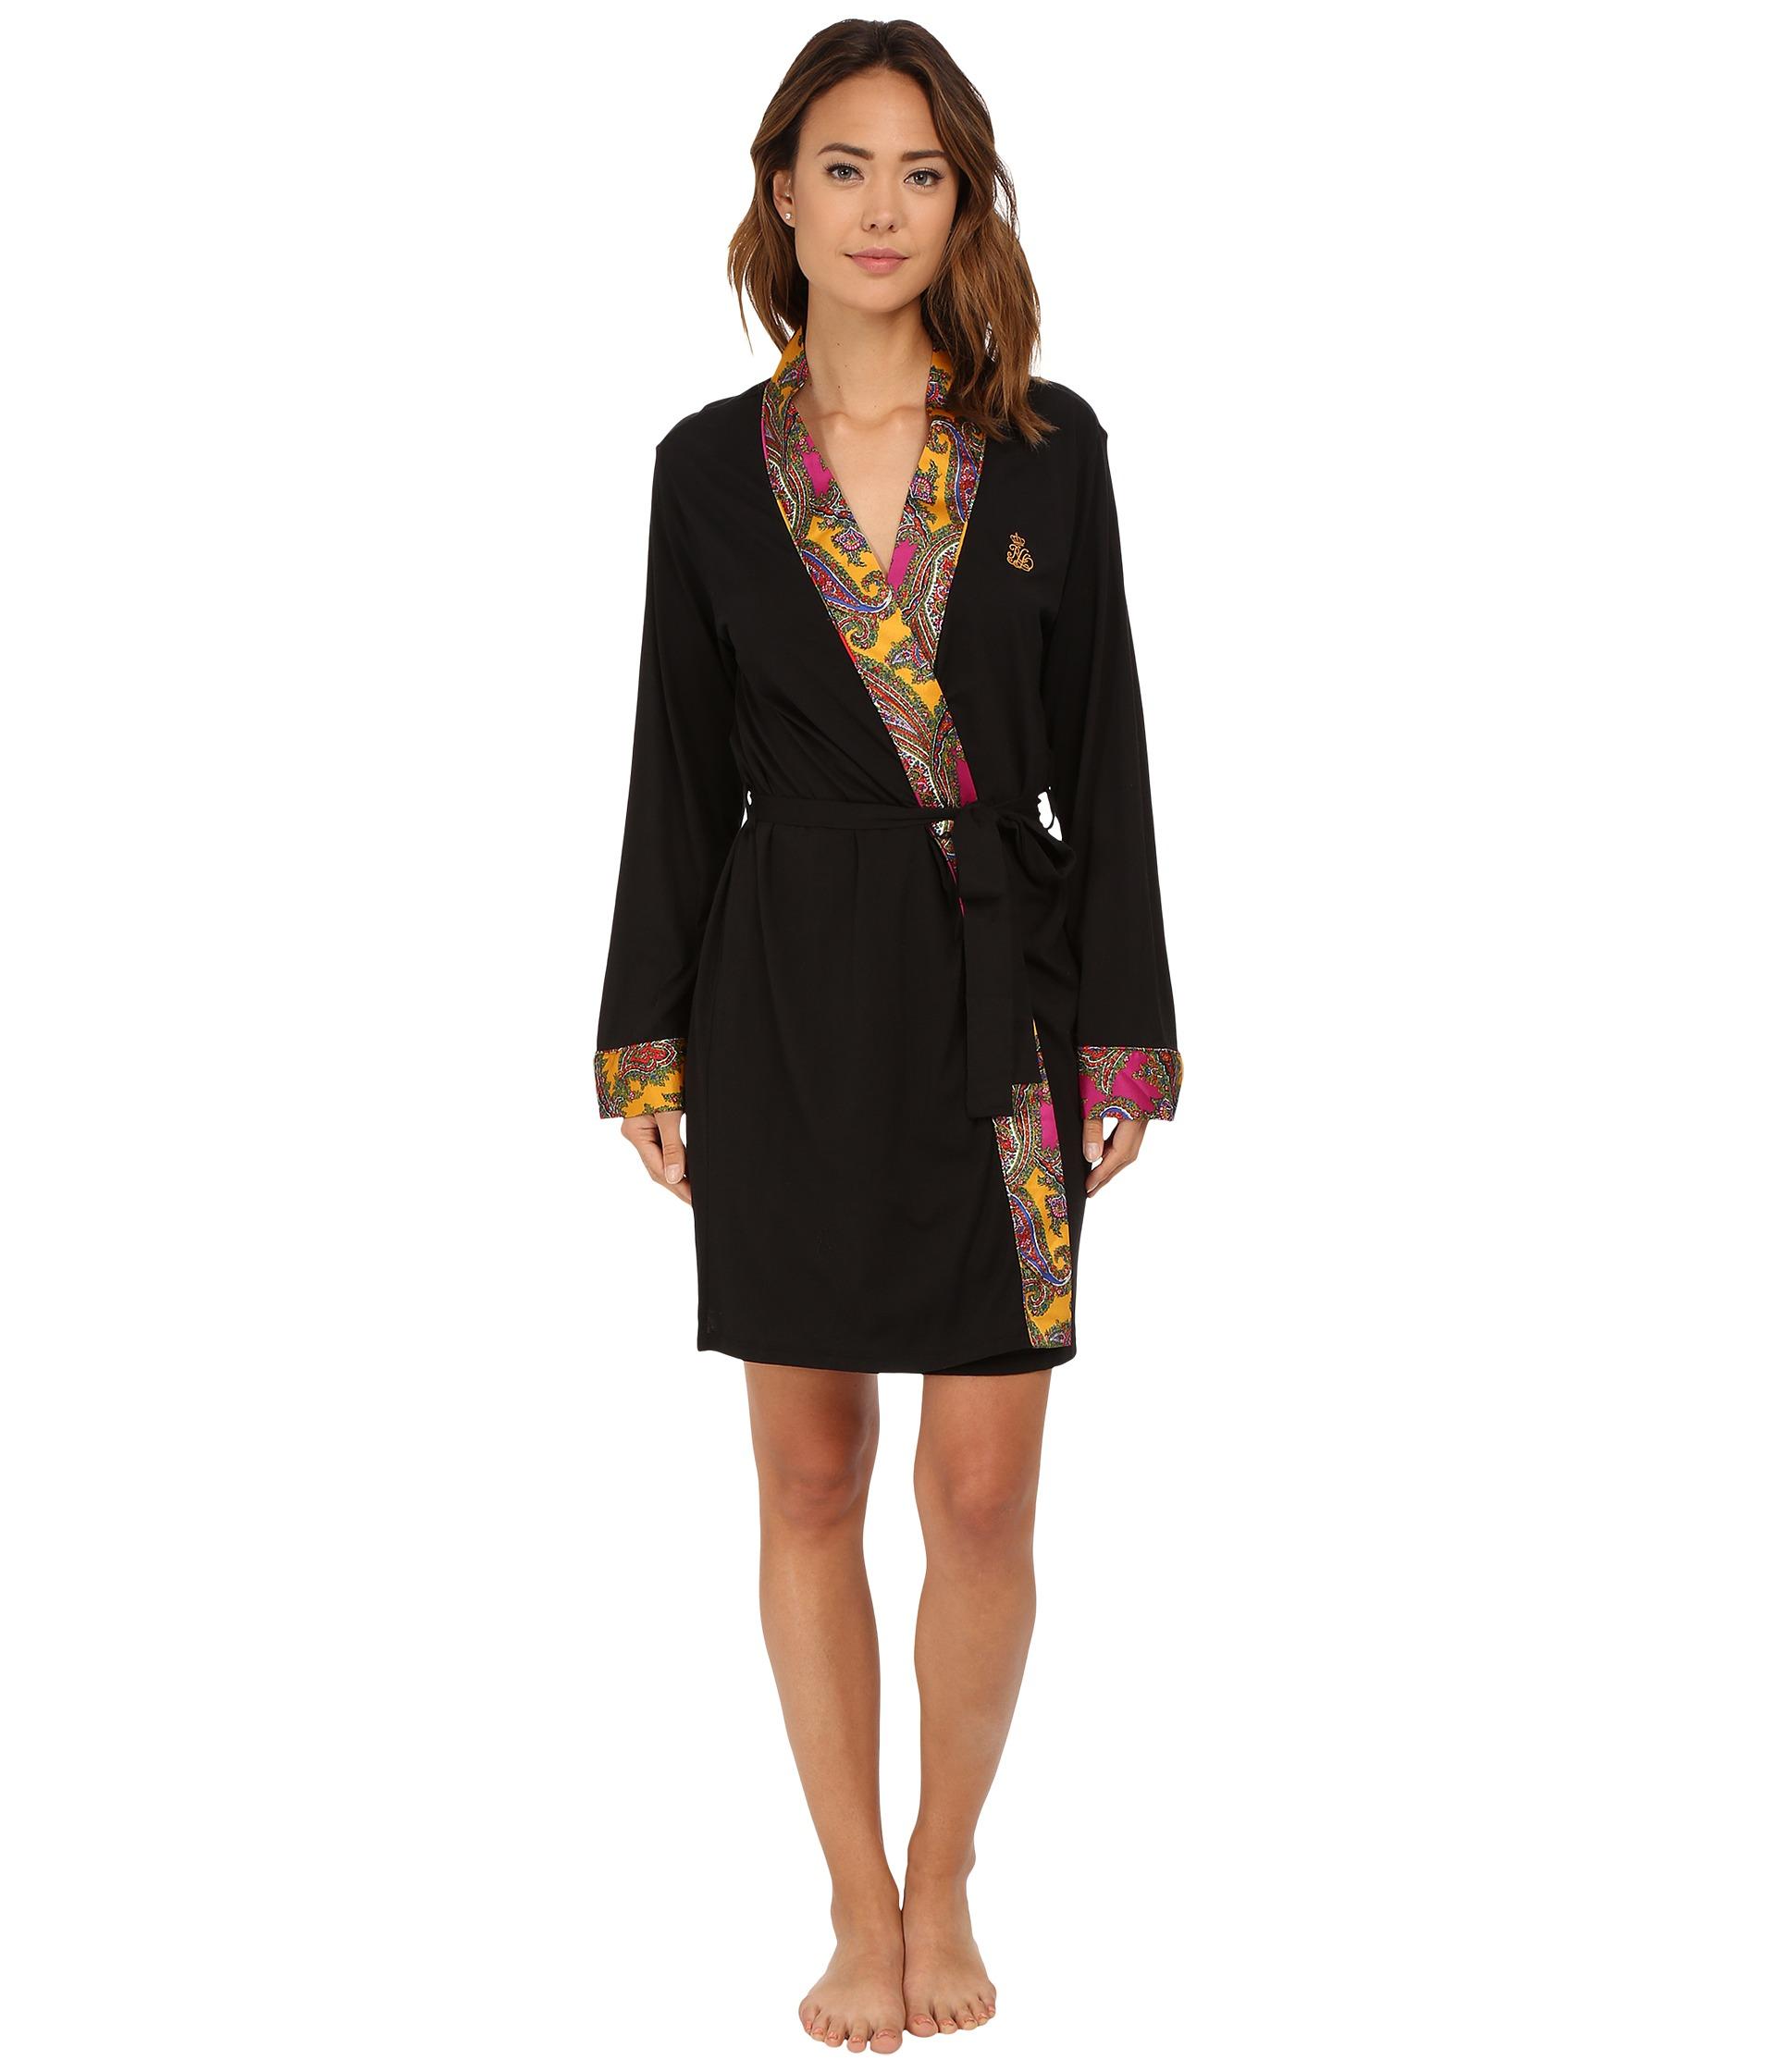 lauren by ralph lauren kimono satin wrap robe free shipping both ways. Black Bedroom Furniture Sets. Home Design Ideas